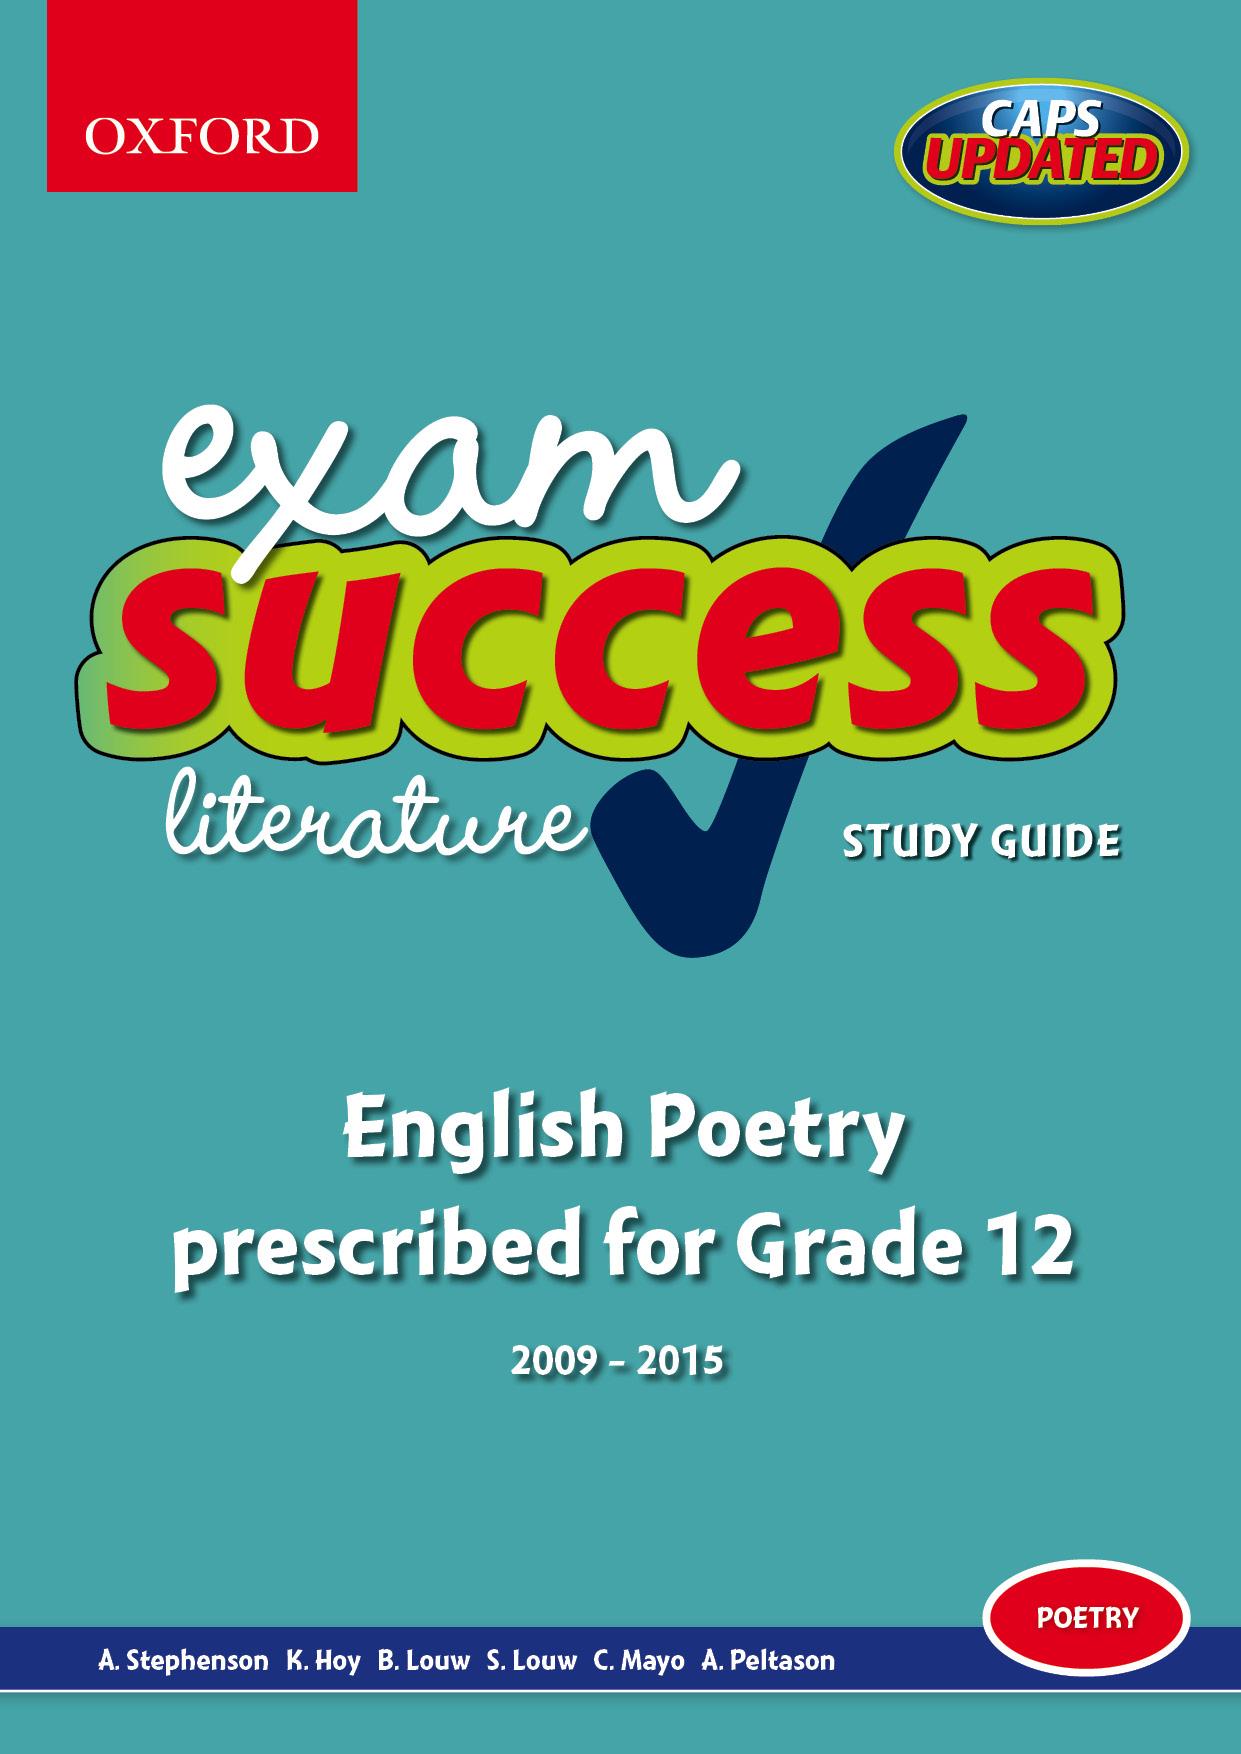 Exam Success Literature Study Guide: English Poetry prescribed for Grade 12